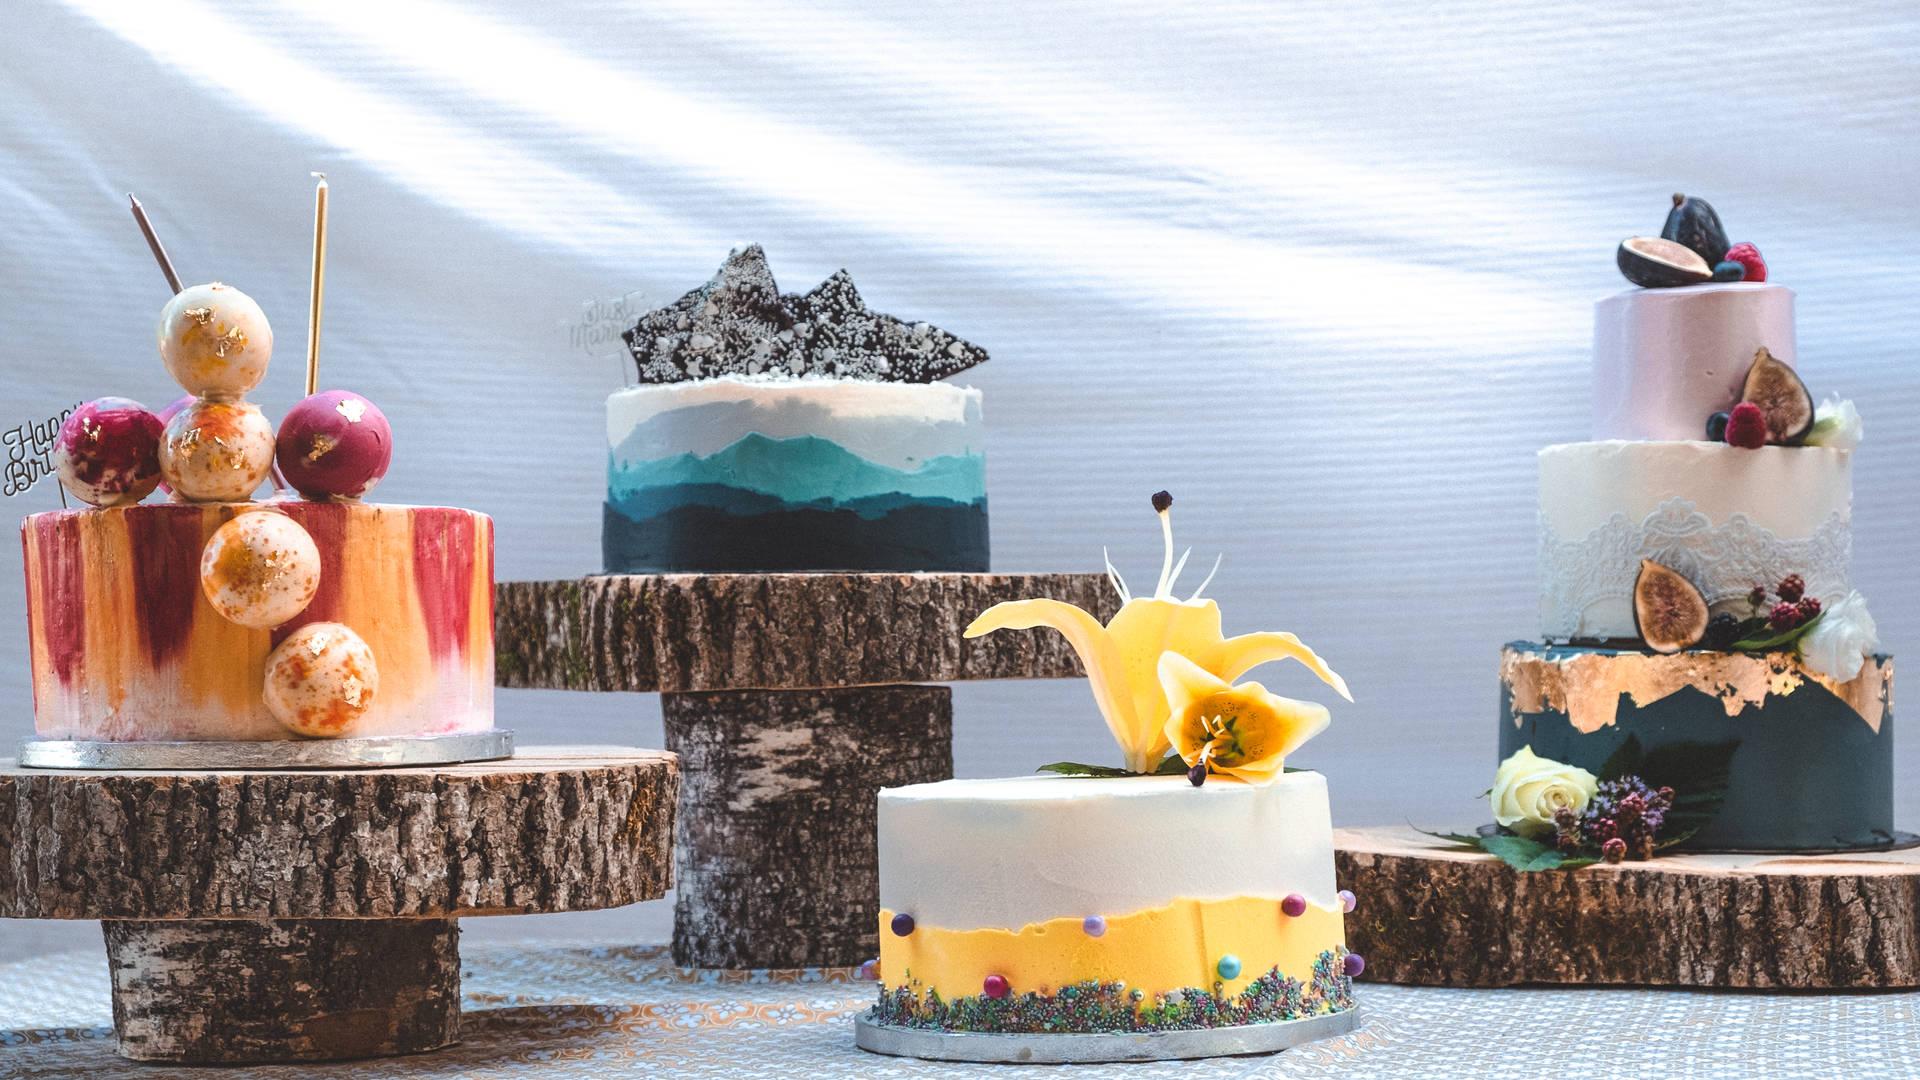 Wedding Cake Morzine Birthday Cake Les Gets